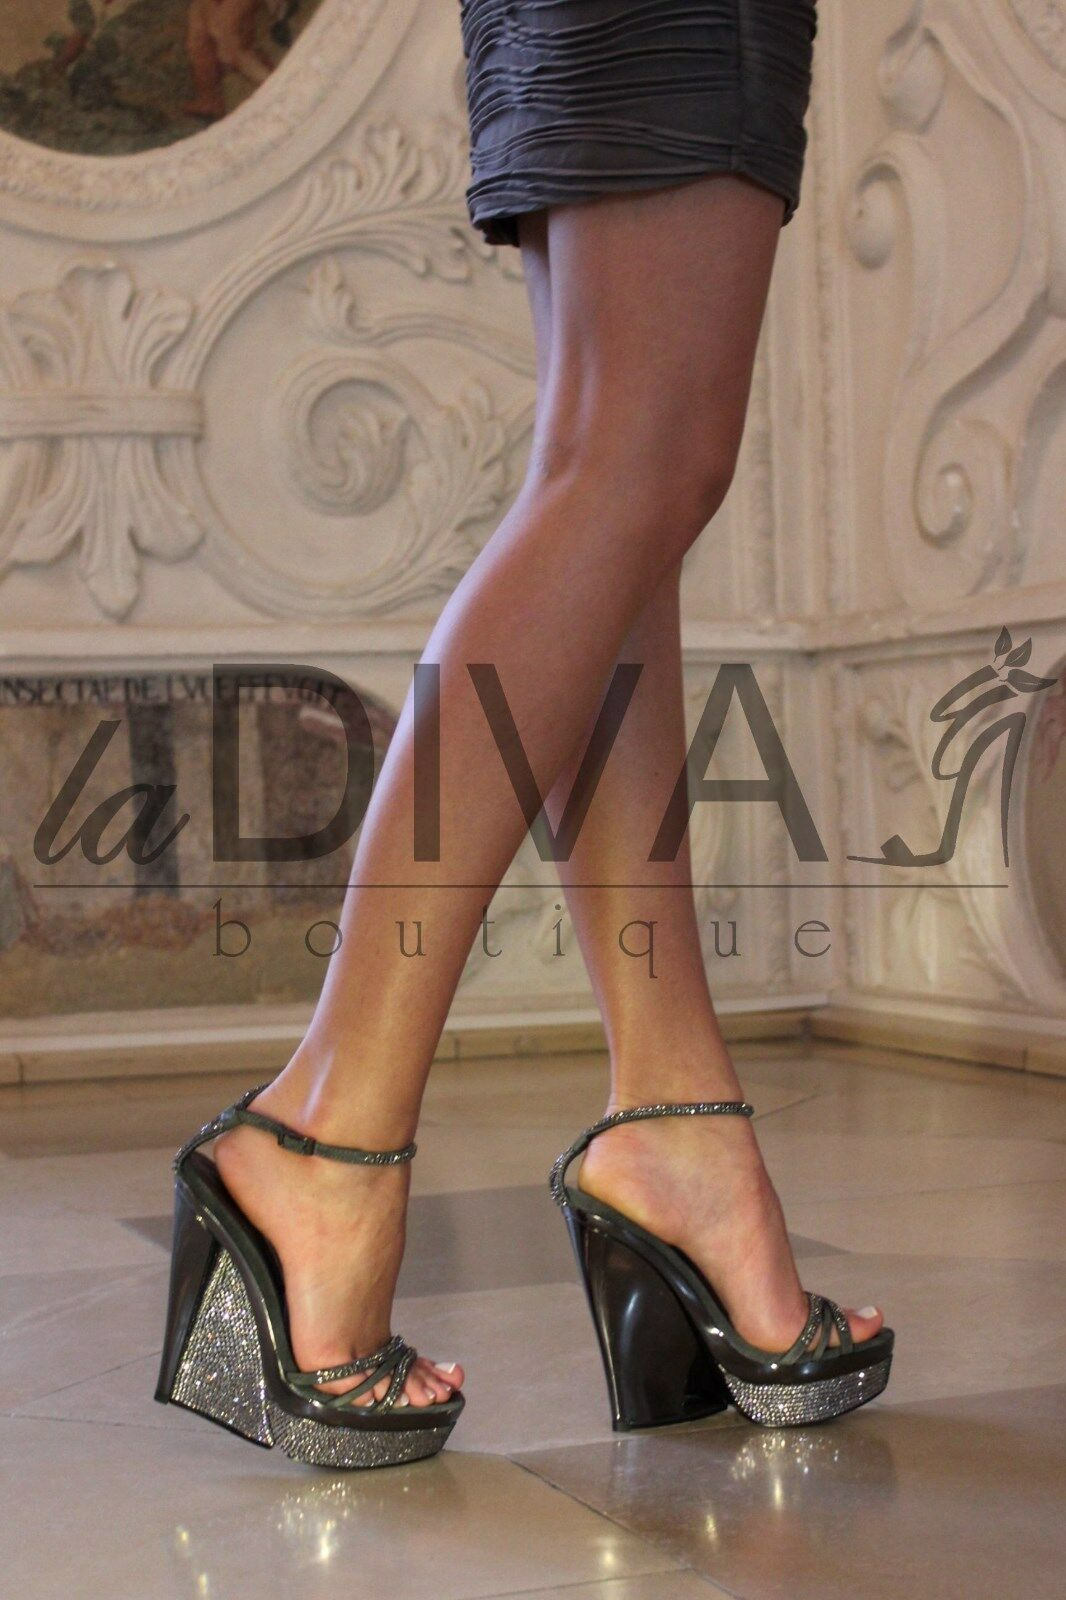 Alberto Venturini  Italia Wedge Leather Sandals Pump 40  grigio% Sale% Ovp  Sconto del 70%